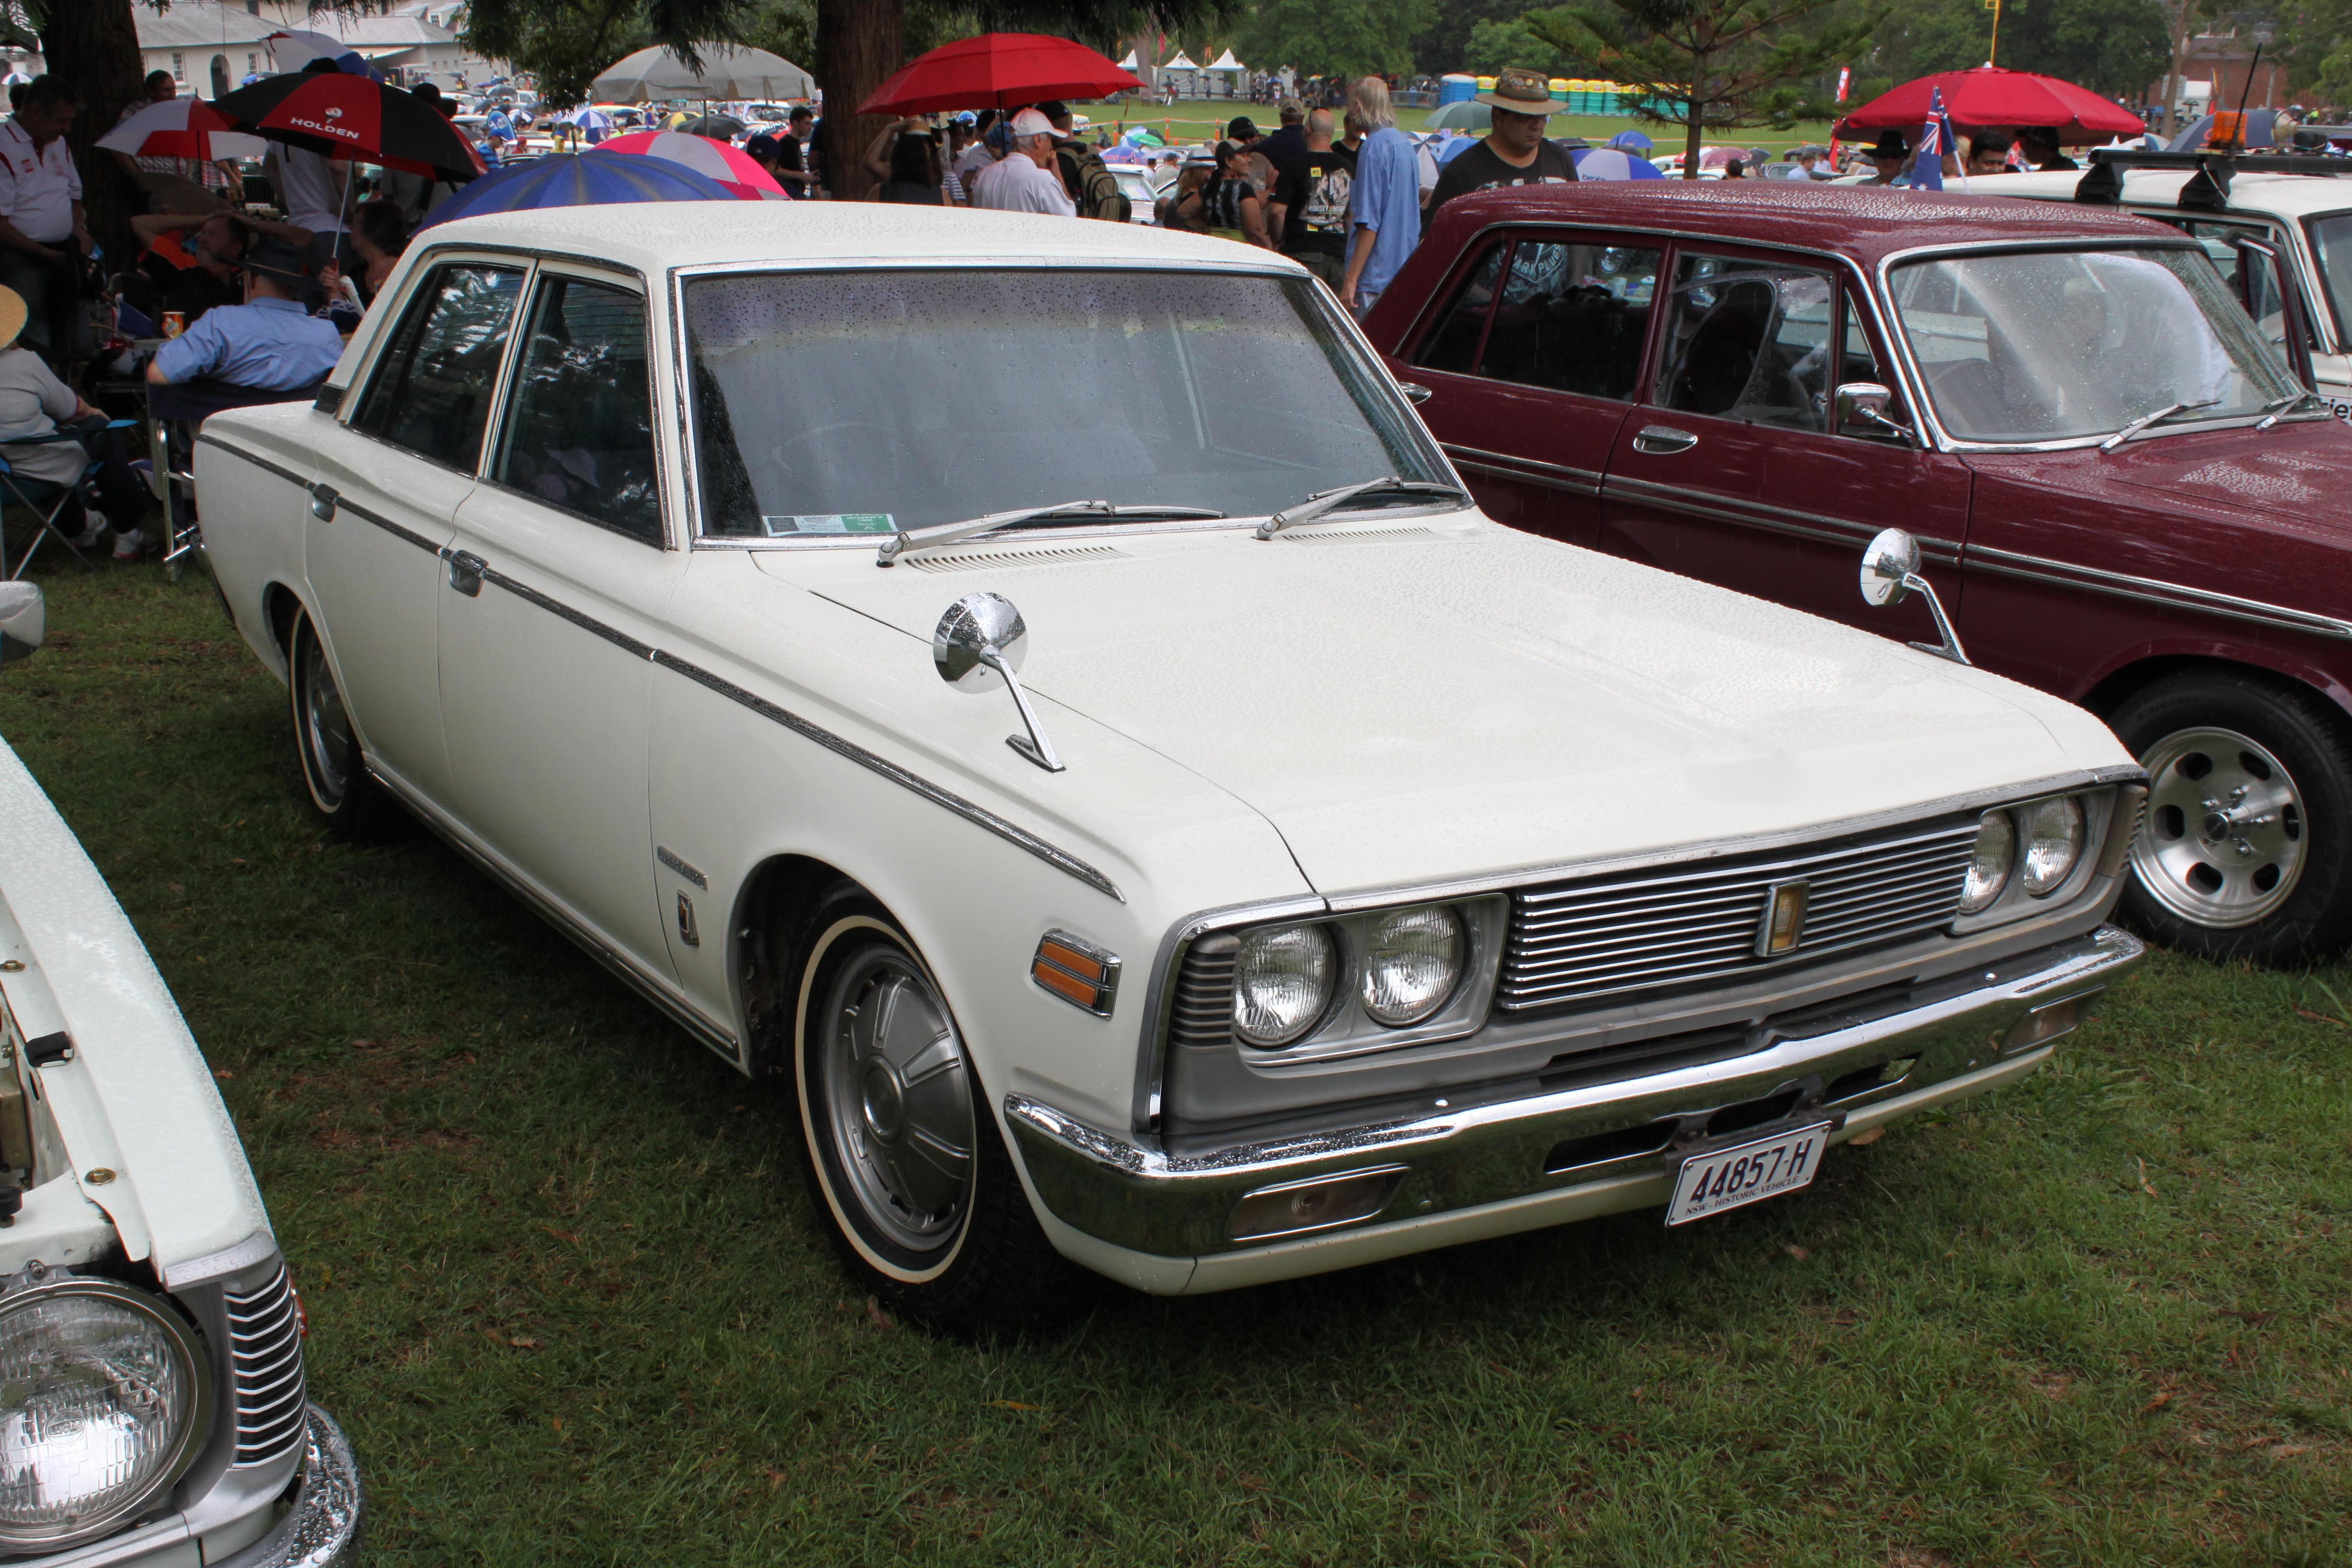 Kelebihan Kekurangan Toyota Crown 1970 Perbandingan Harga